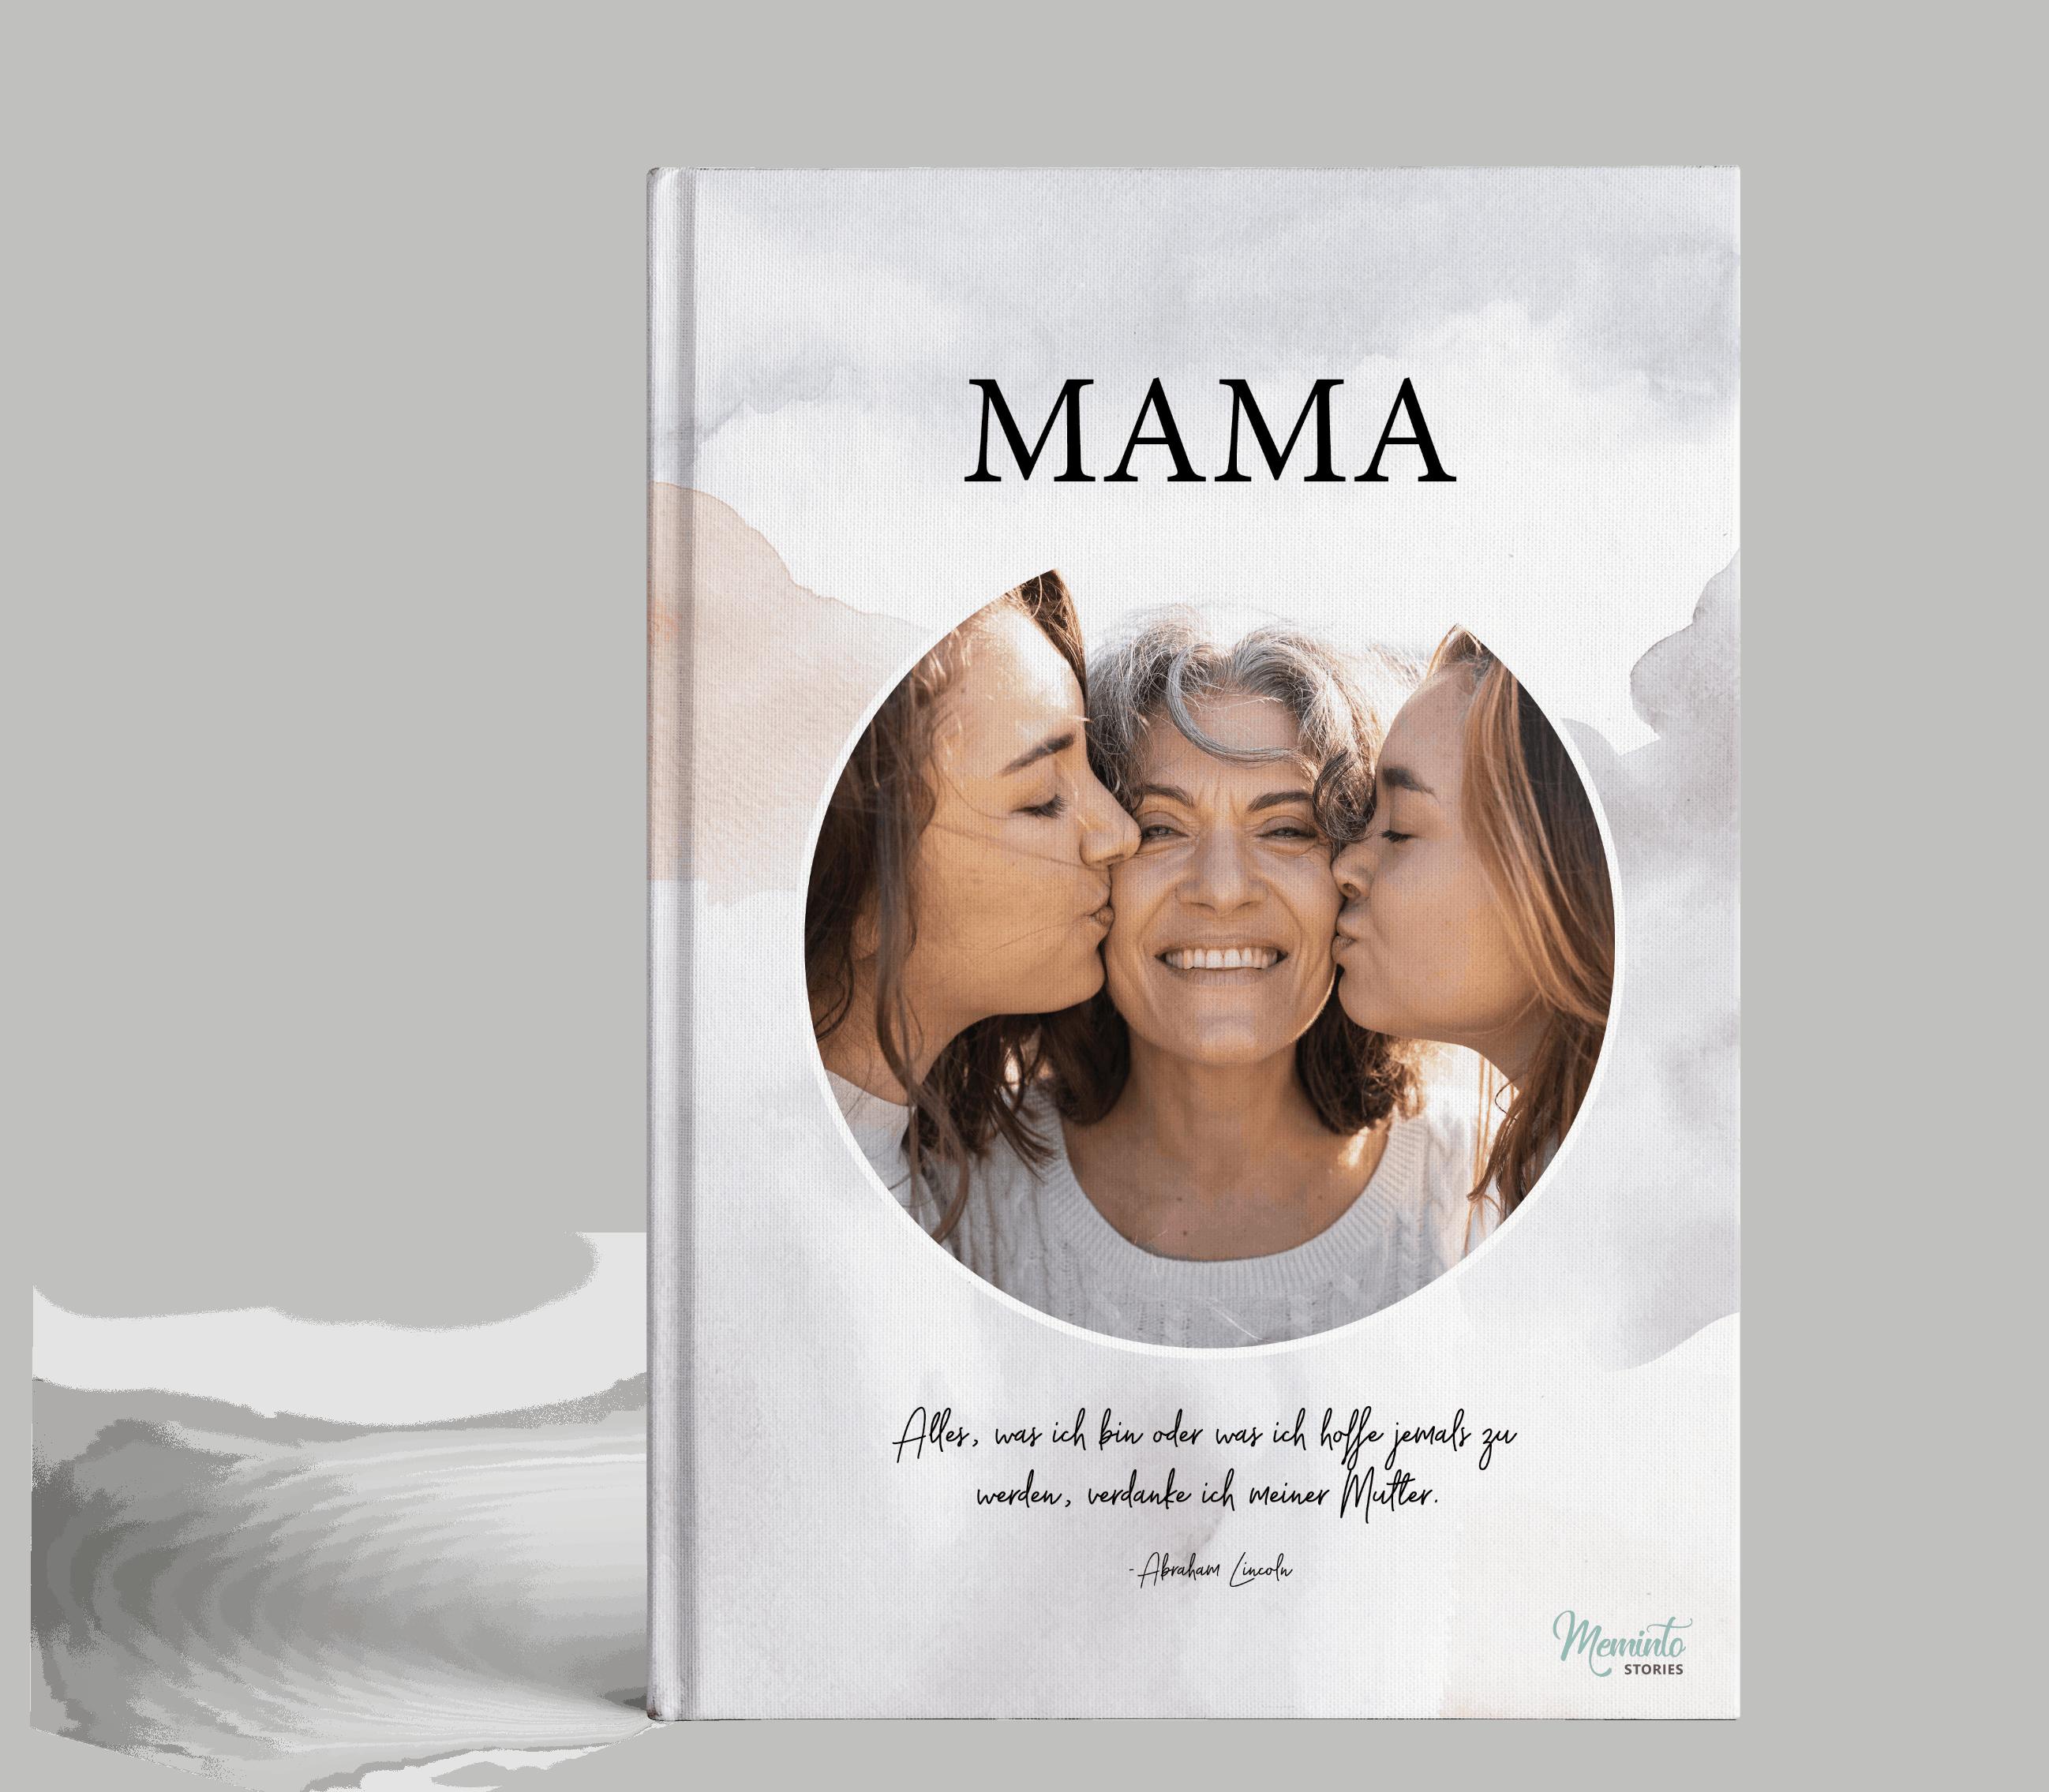 Mama_Book1